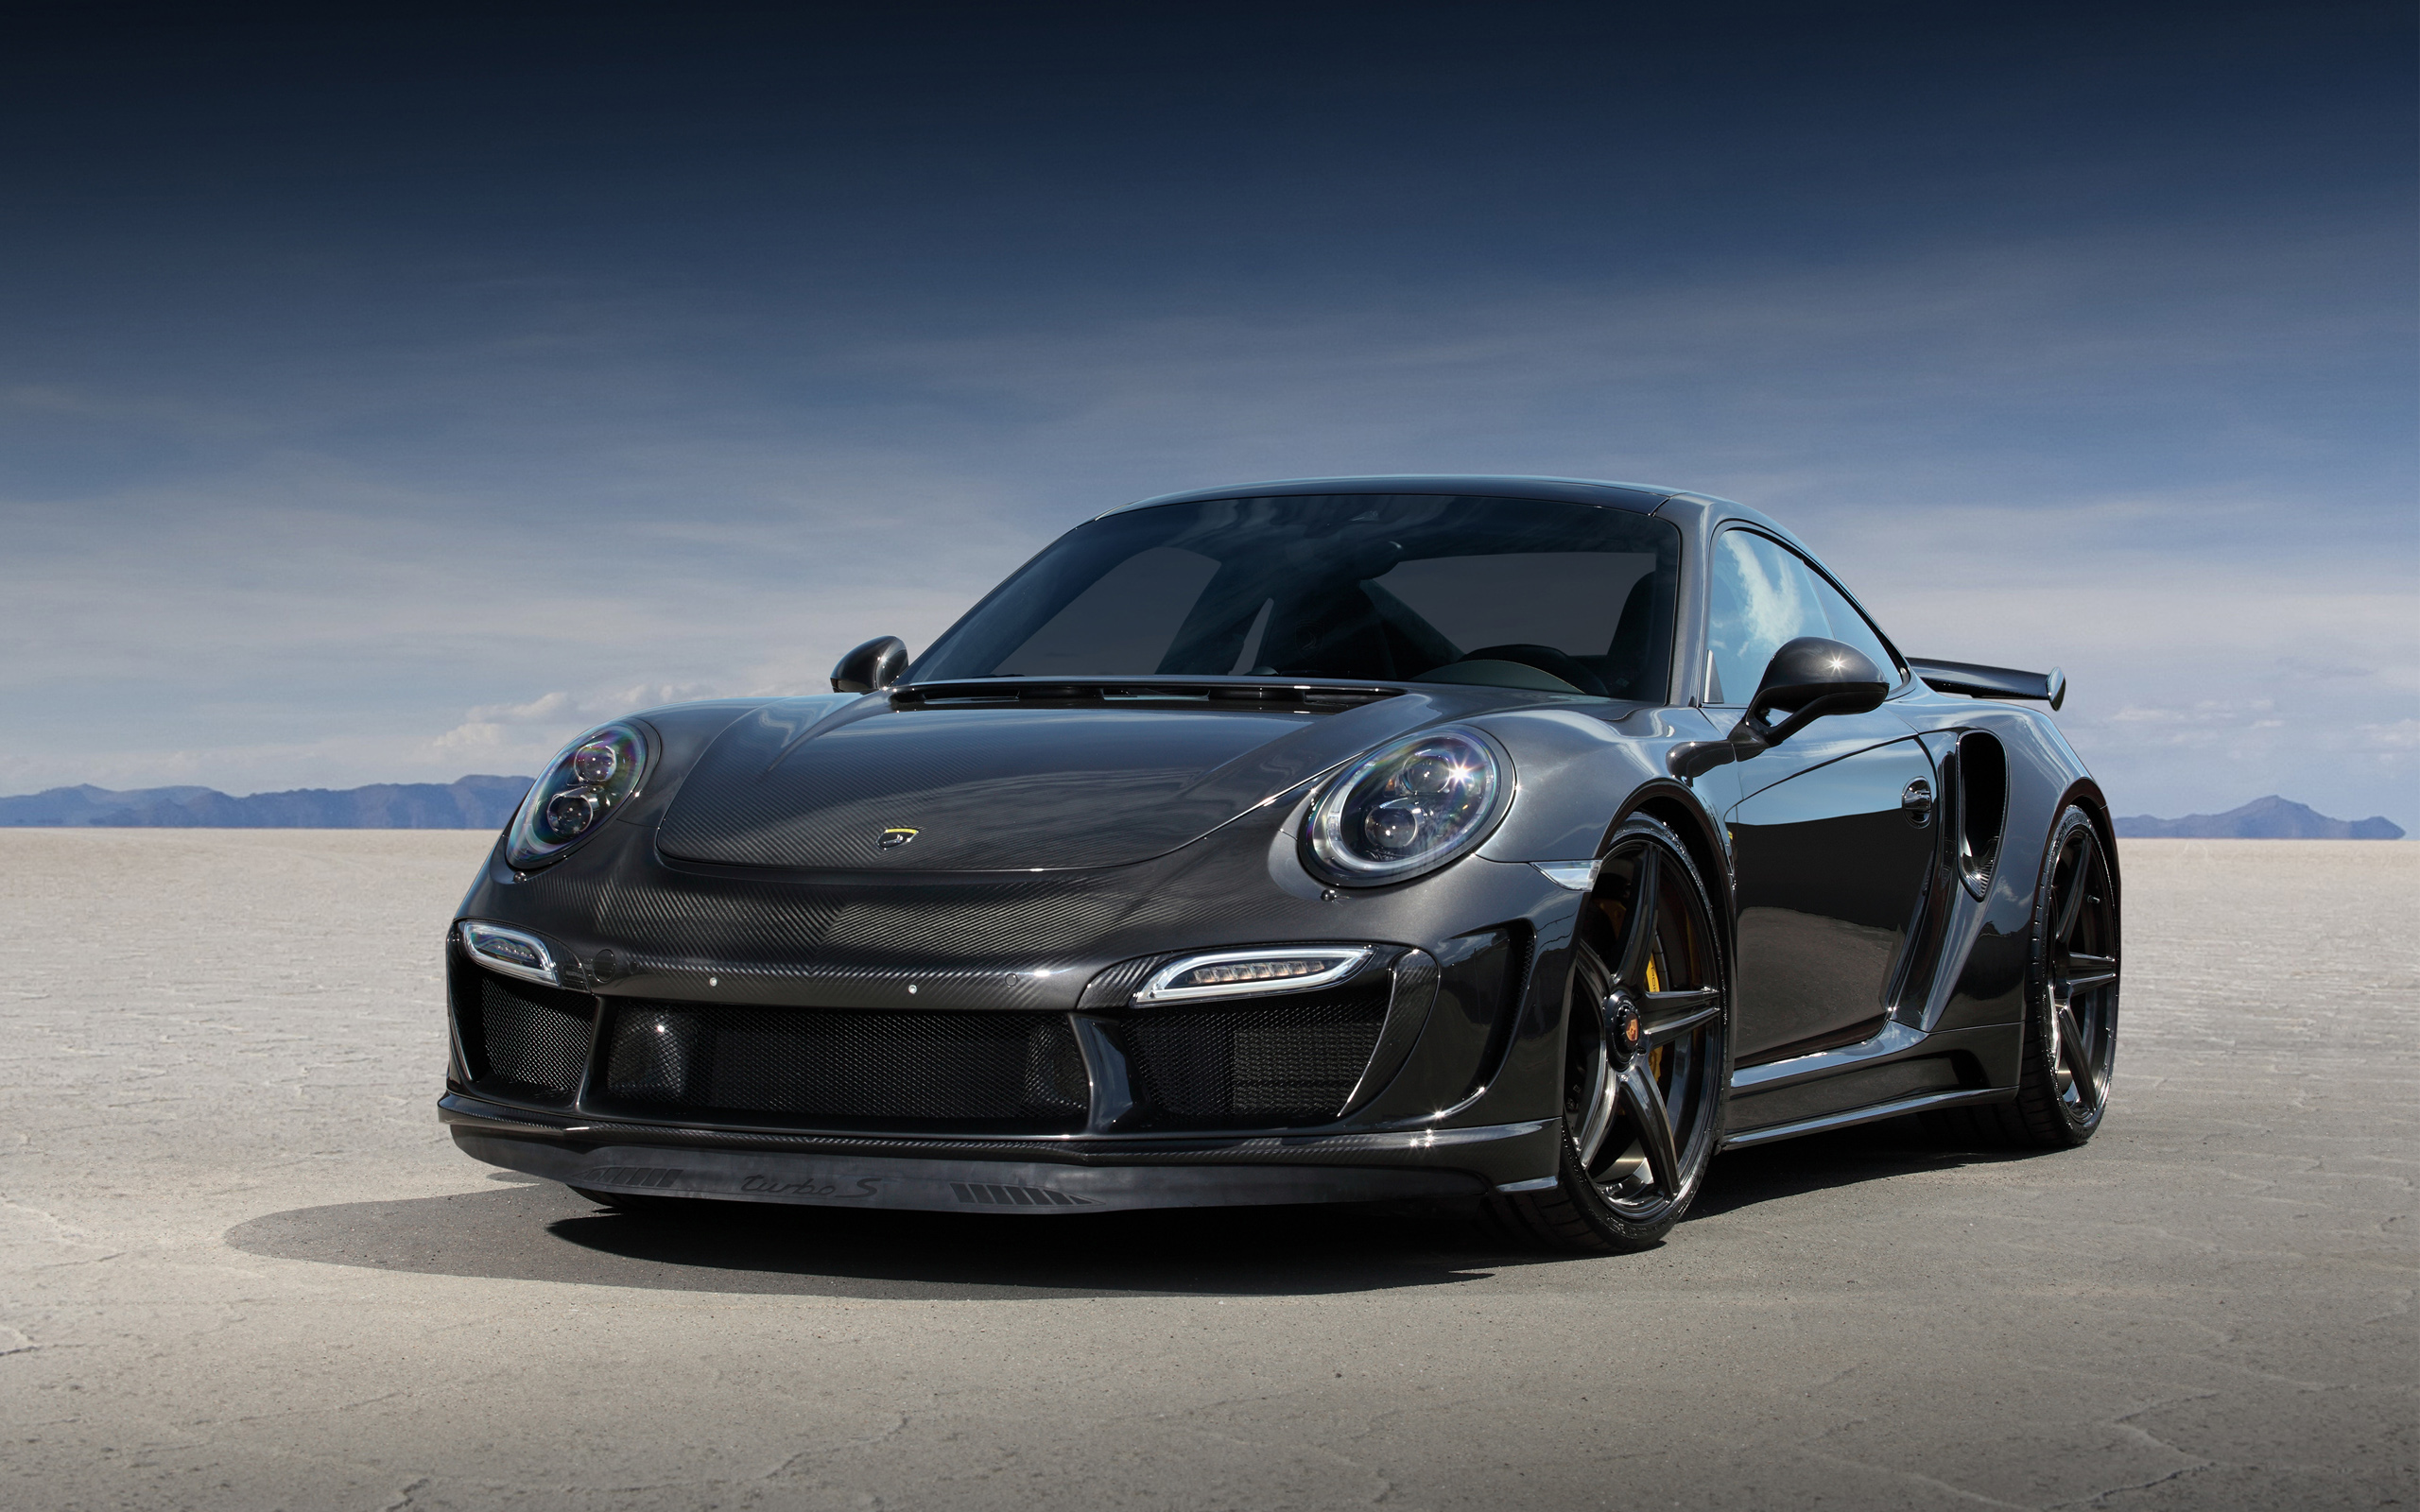 2015 Topcar Porsche 911 Turbo Wallpaper HD Car Wallpapers 2560x1600